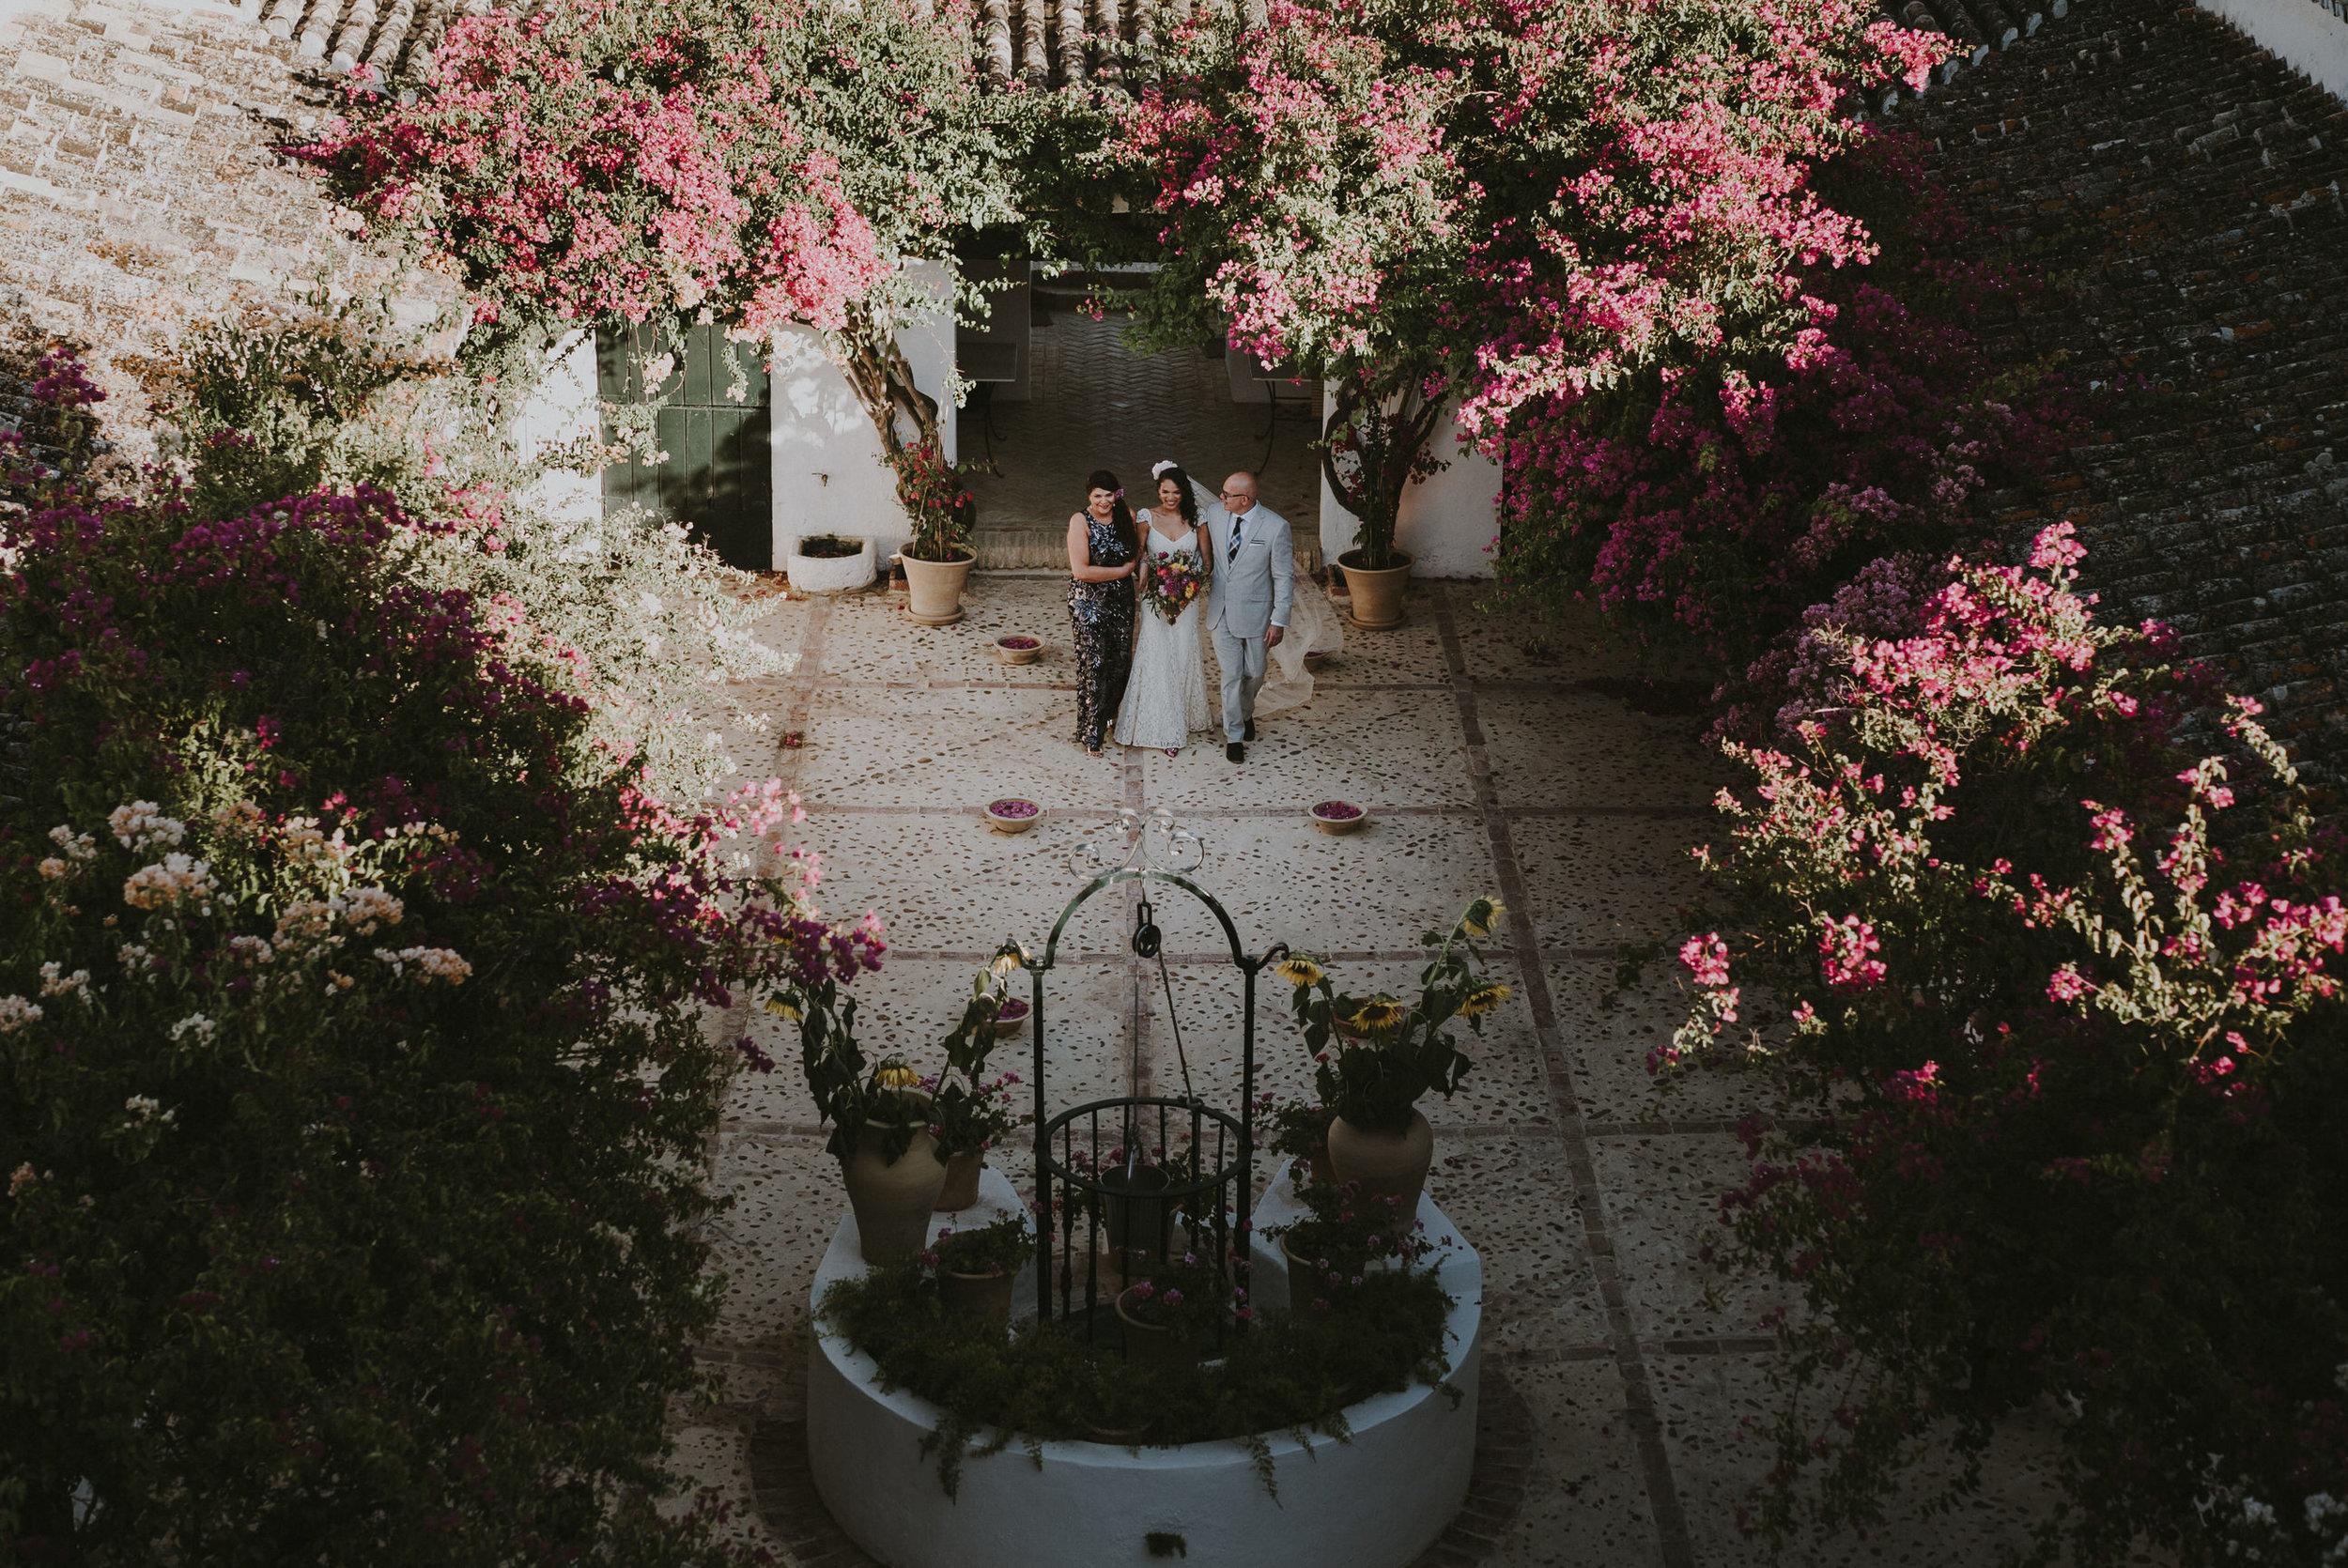 Andres+Amarillo+fotografo+boda+sevilla+natural+sin+poses+hacienda+san+rafael (56).JPG